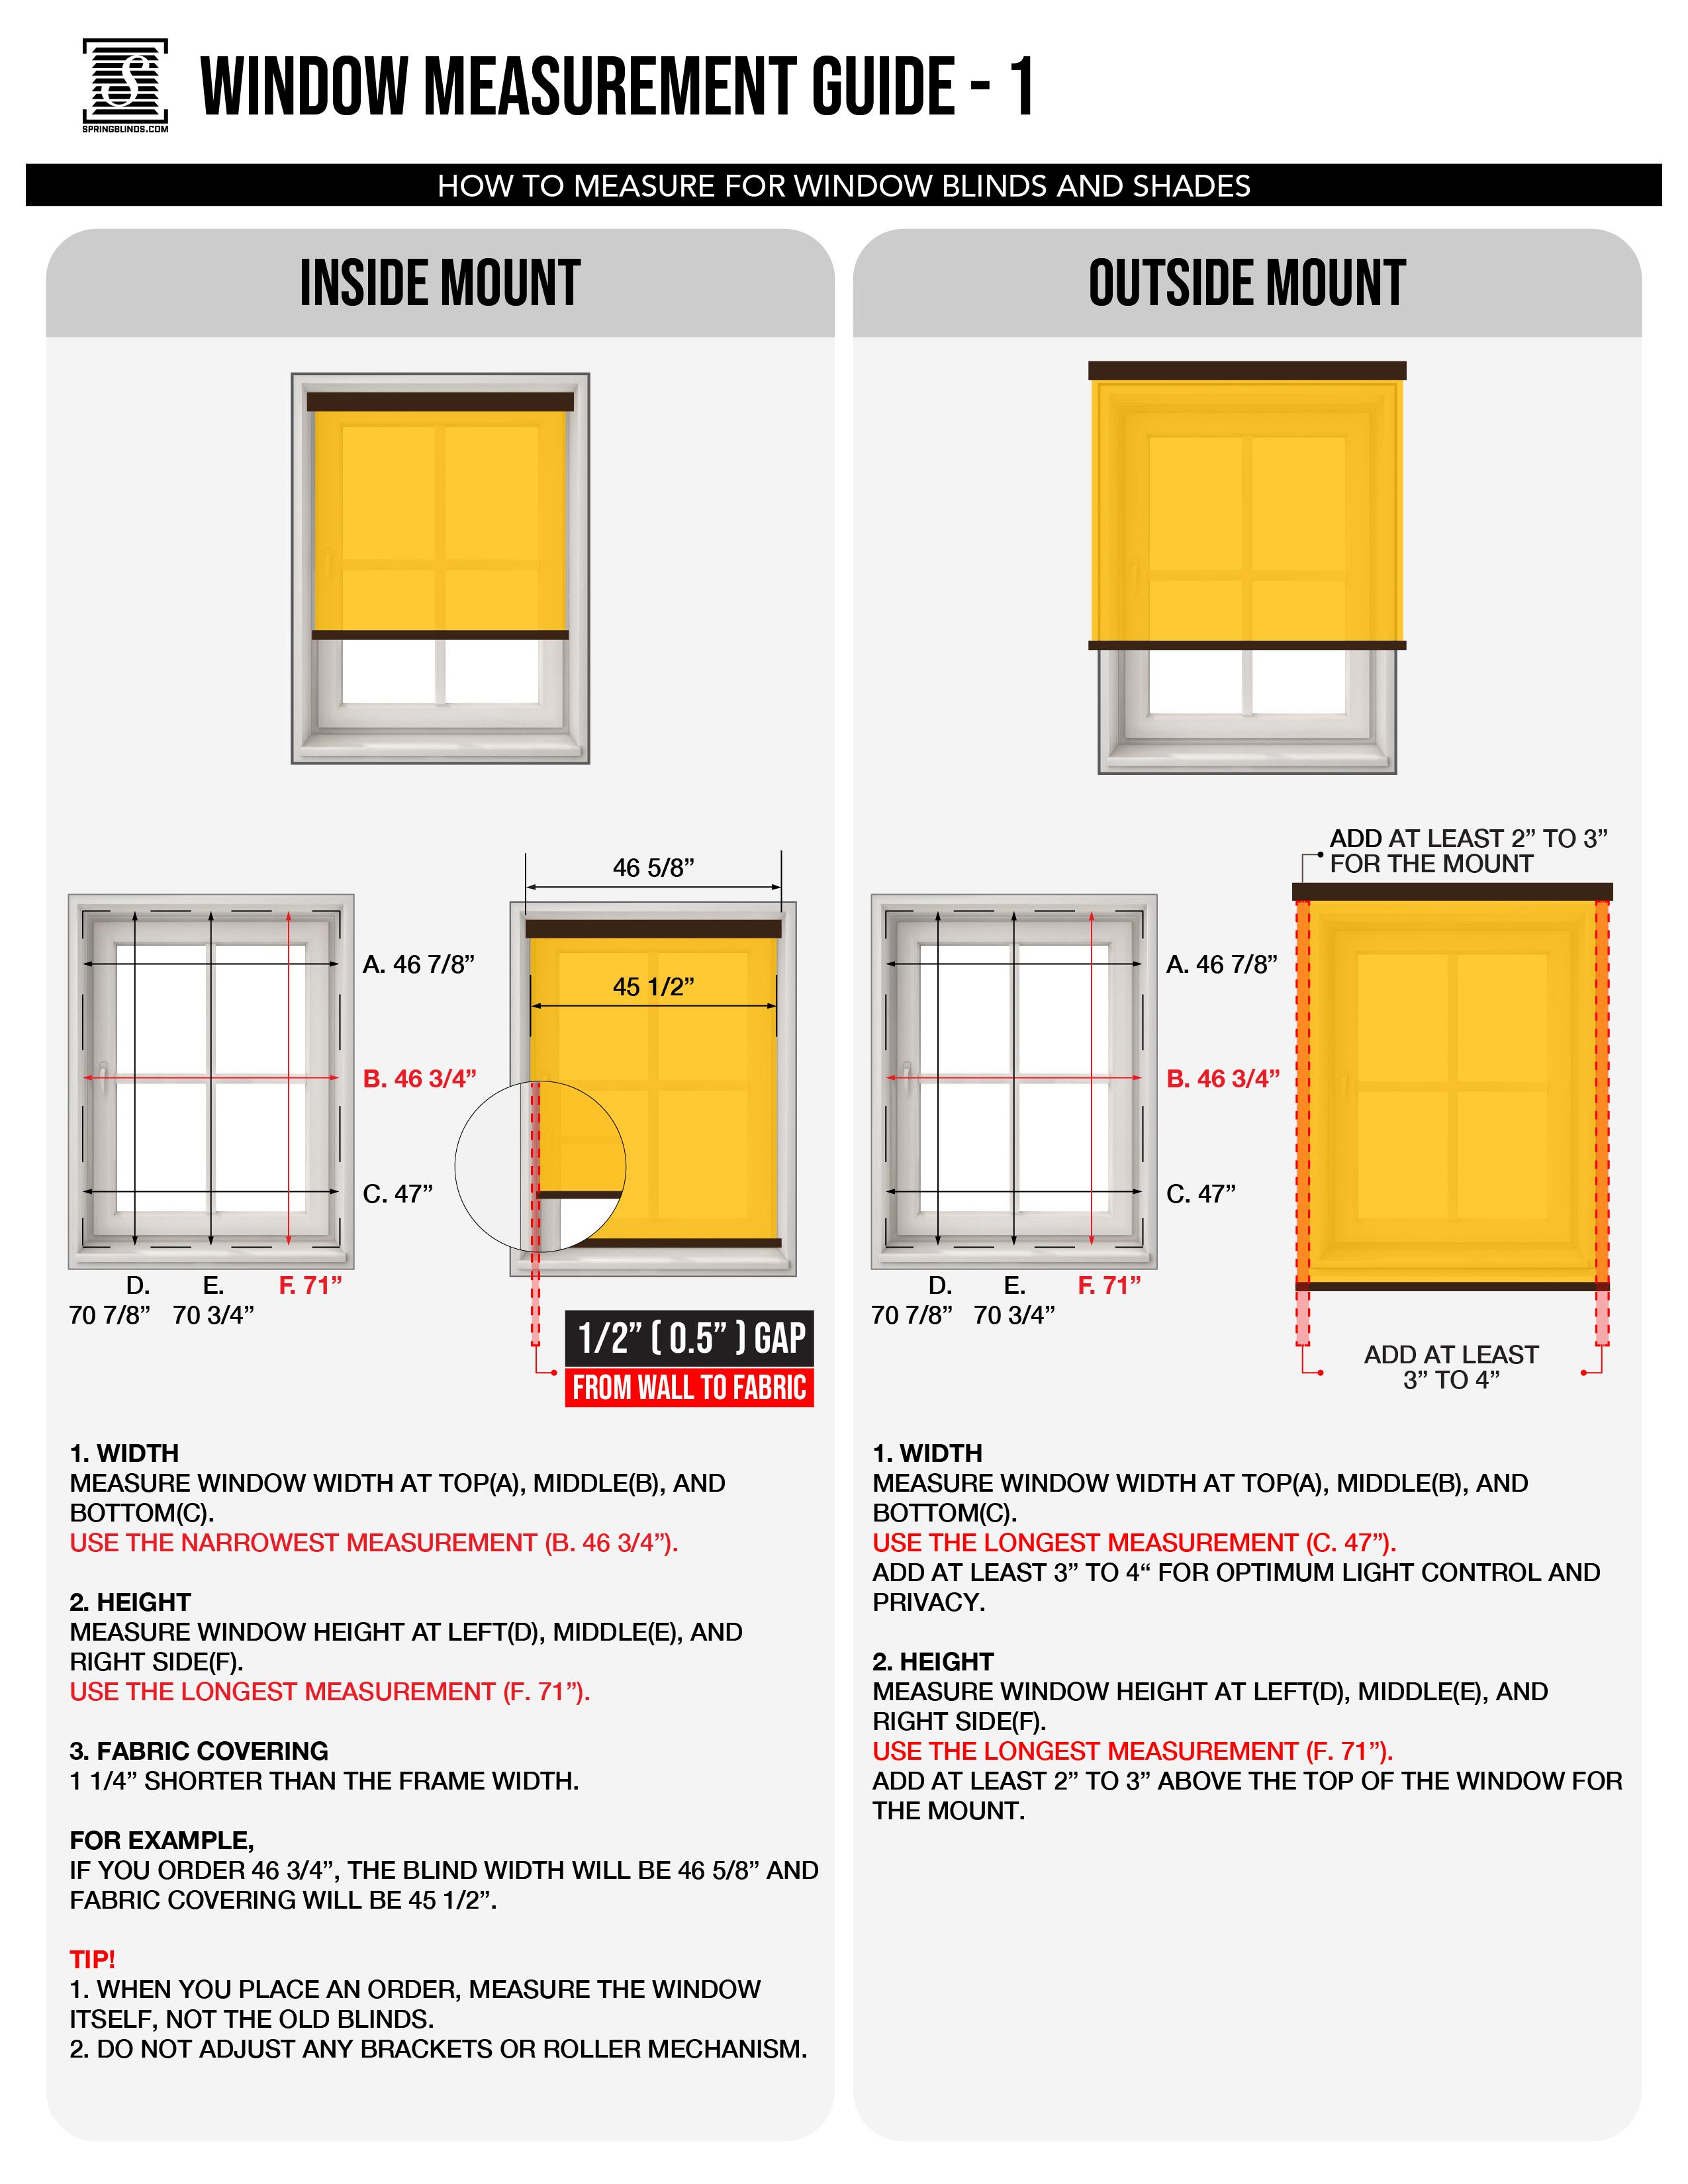 guide-3p-window-measurement-guide-1-021221.jpg